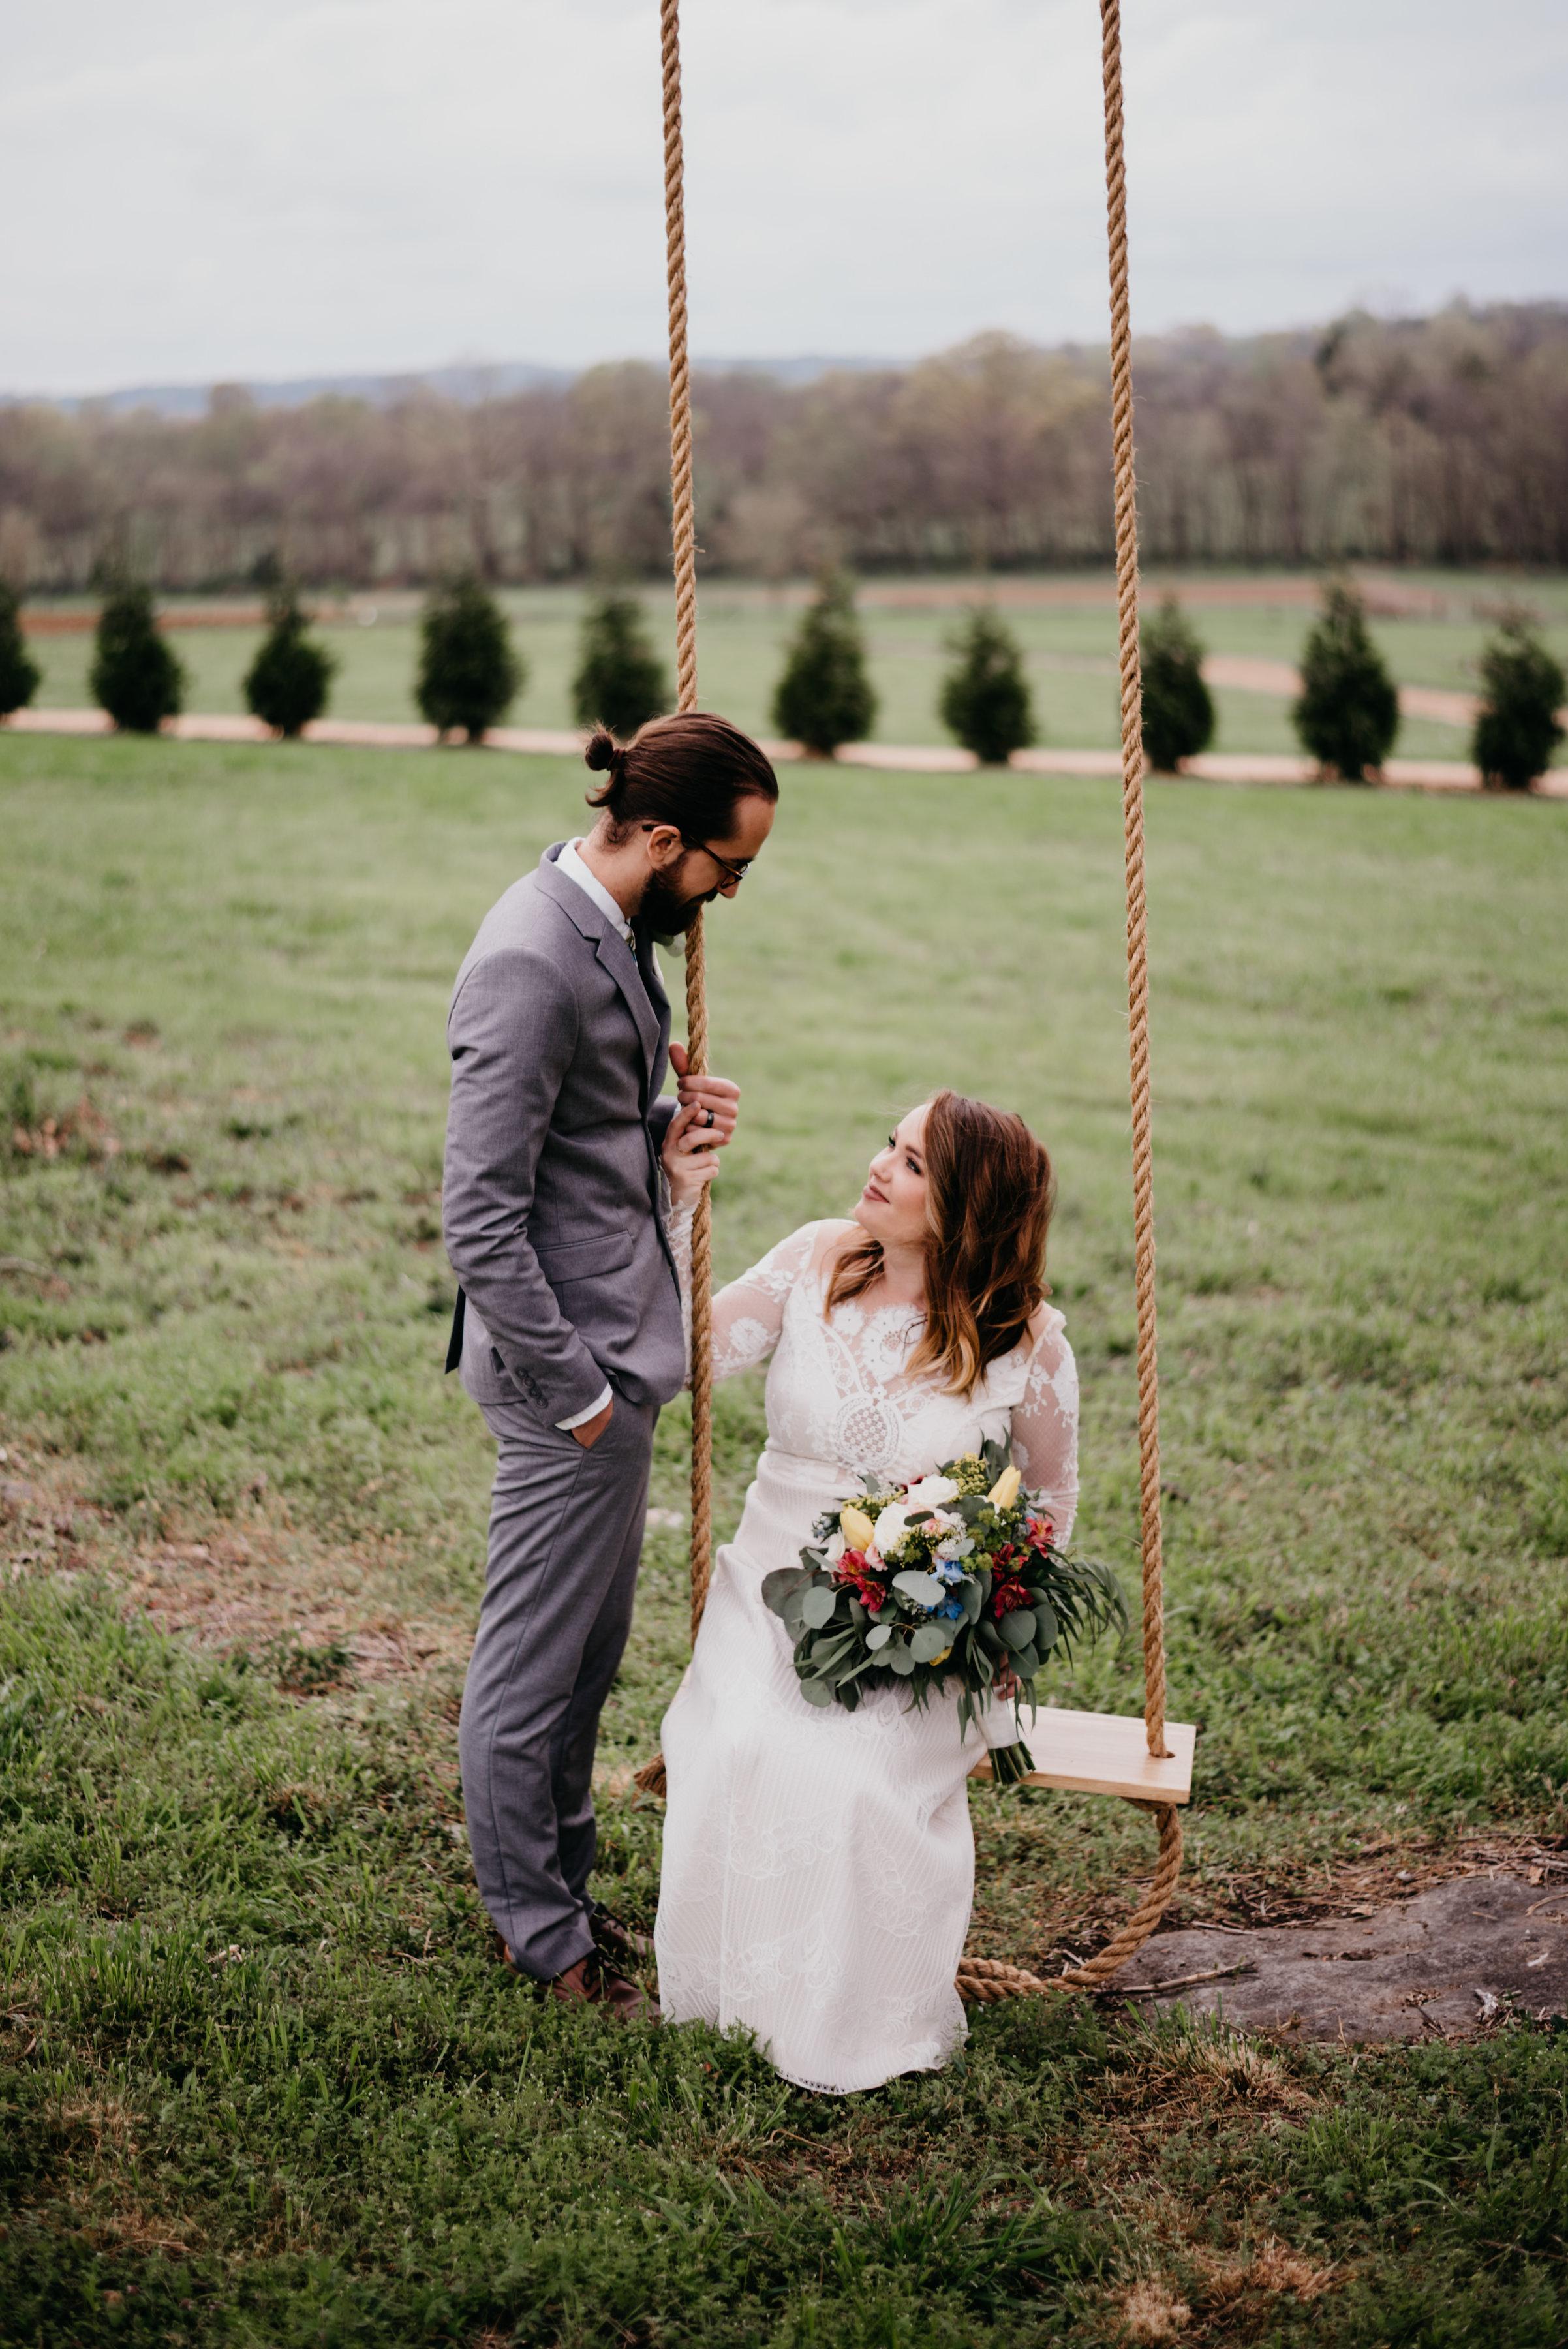 Allenbrooke-Farms-Nashville-Wedding-Photographers 42.jpg